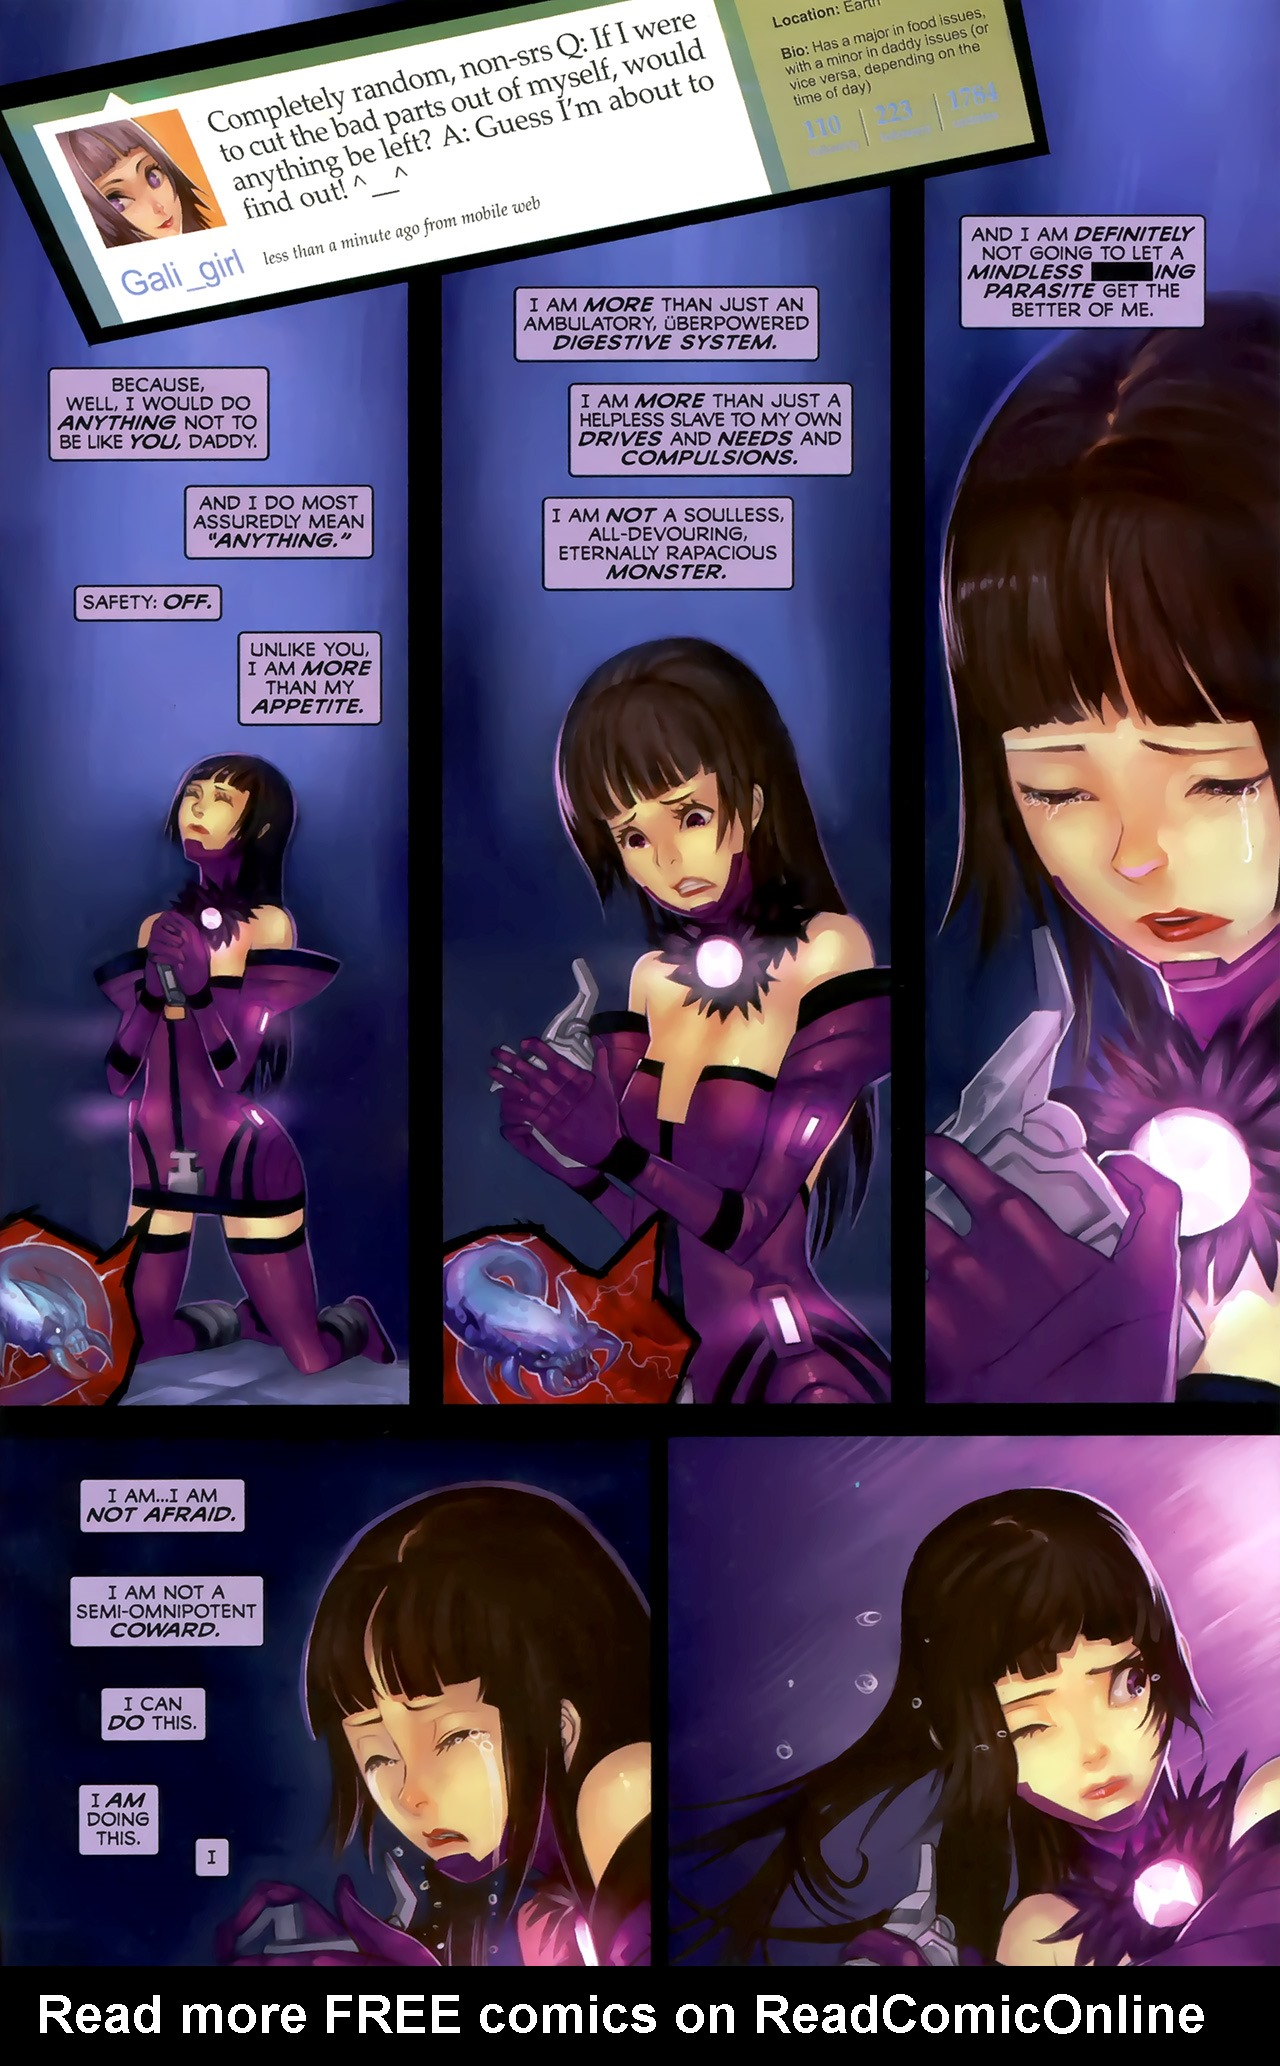 Read online Galacta: Daughter of Galactus comic -  Issue # Full - 30